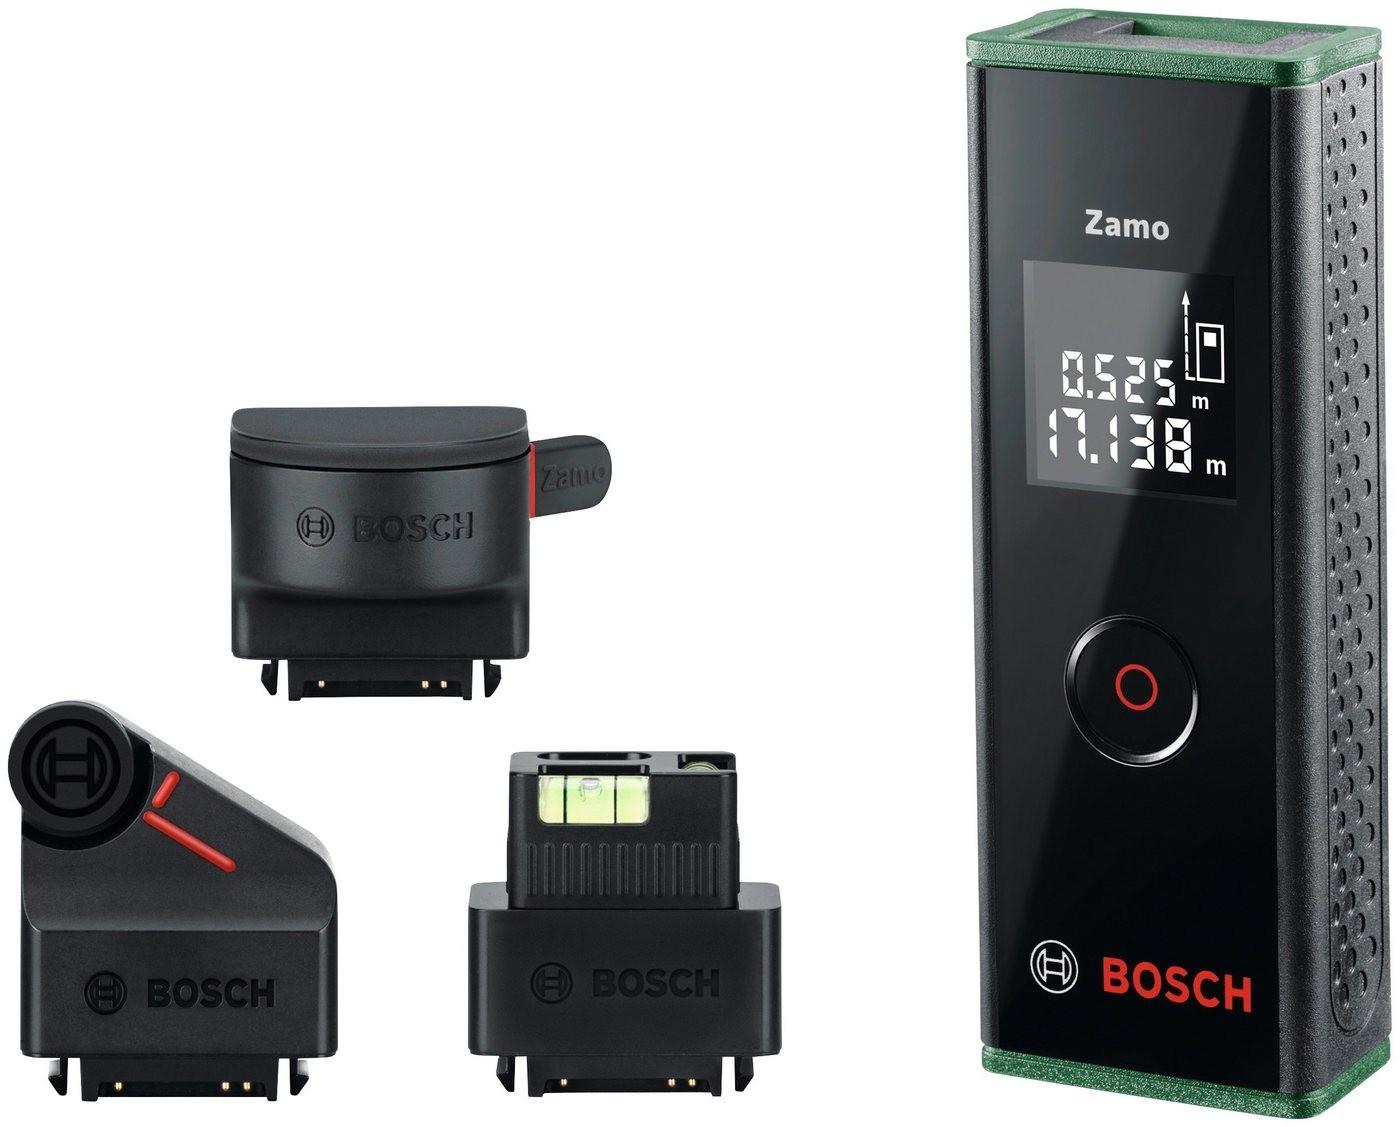 Nikon Prostaff 7i Entfernungsmesser : Rabatt preisvergleich.de haus & garten u003e heimwerken messtechnik